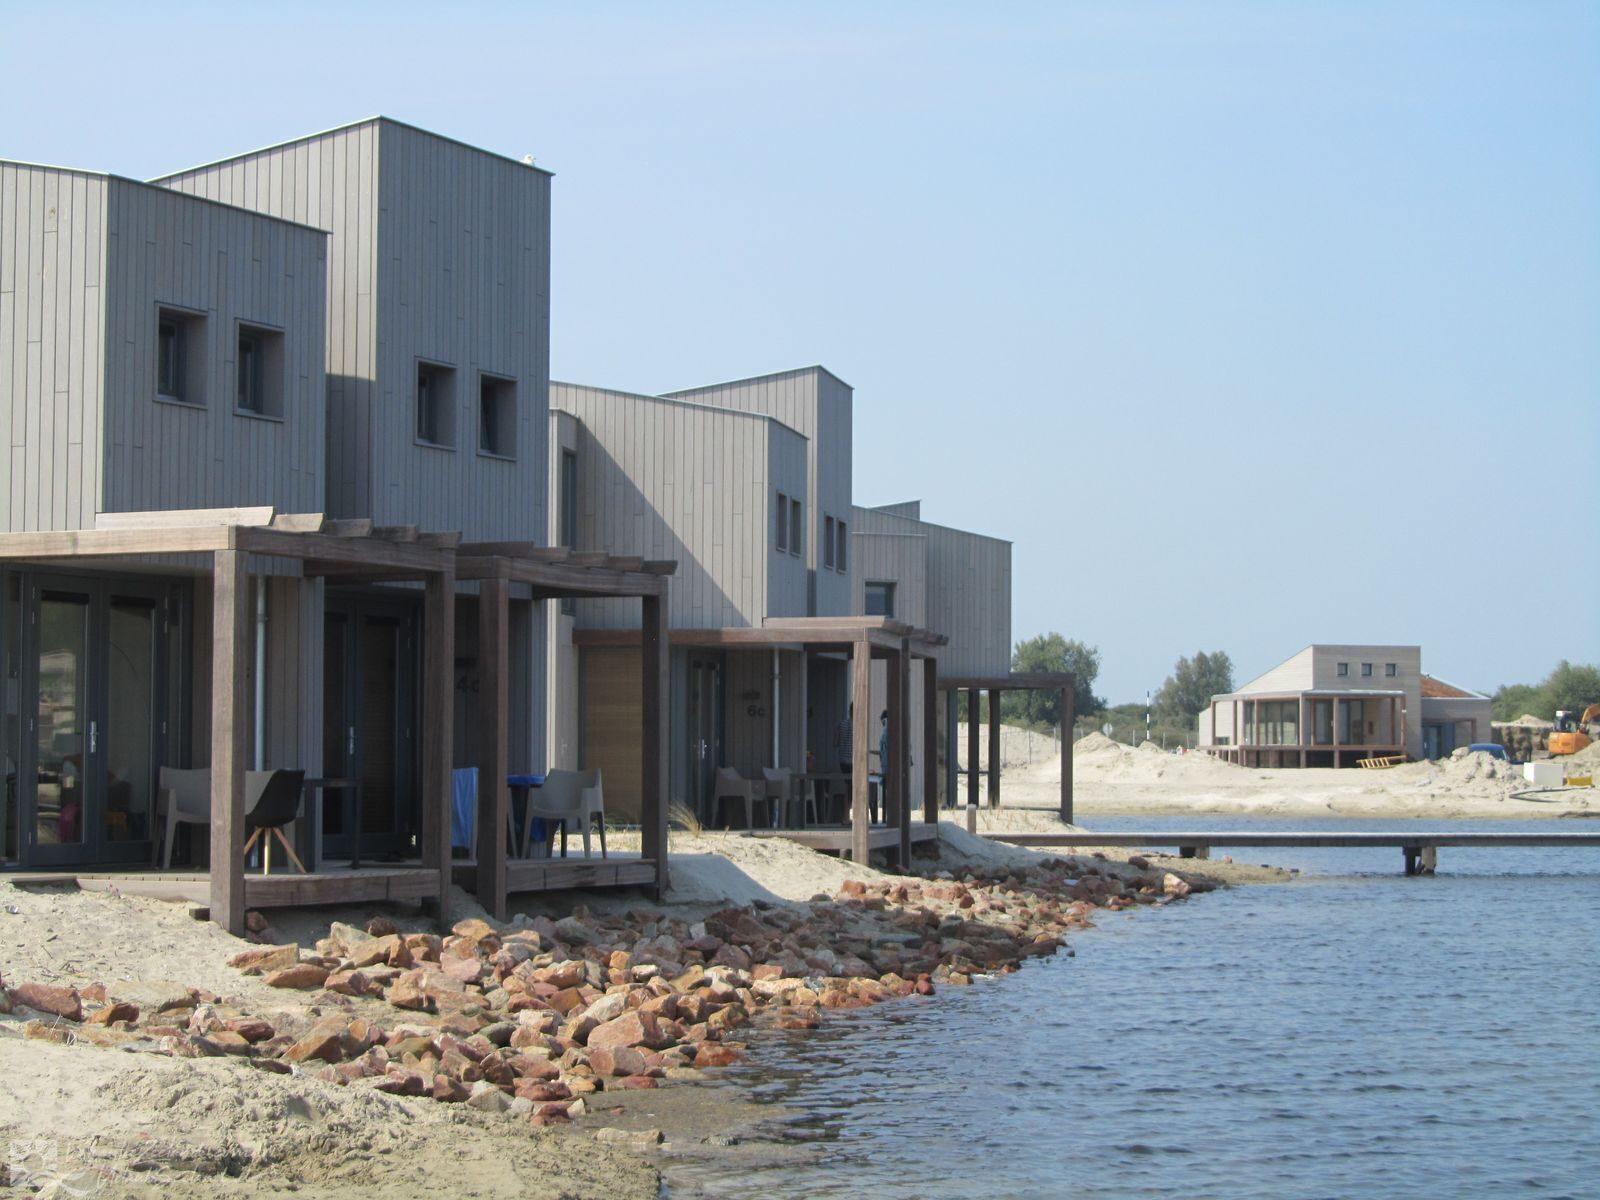 VZ802 Hotelstudio Waterfront Ouddorp